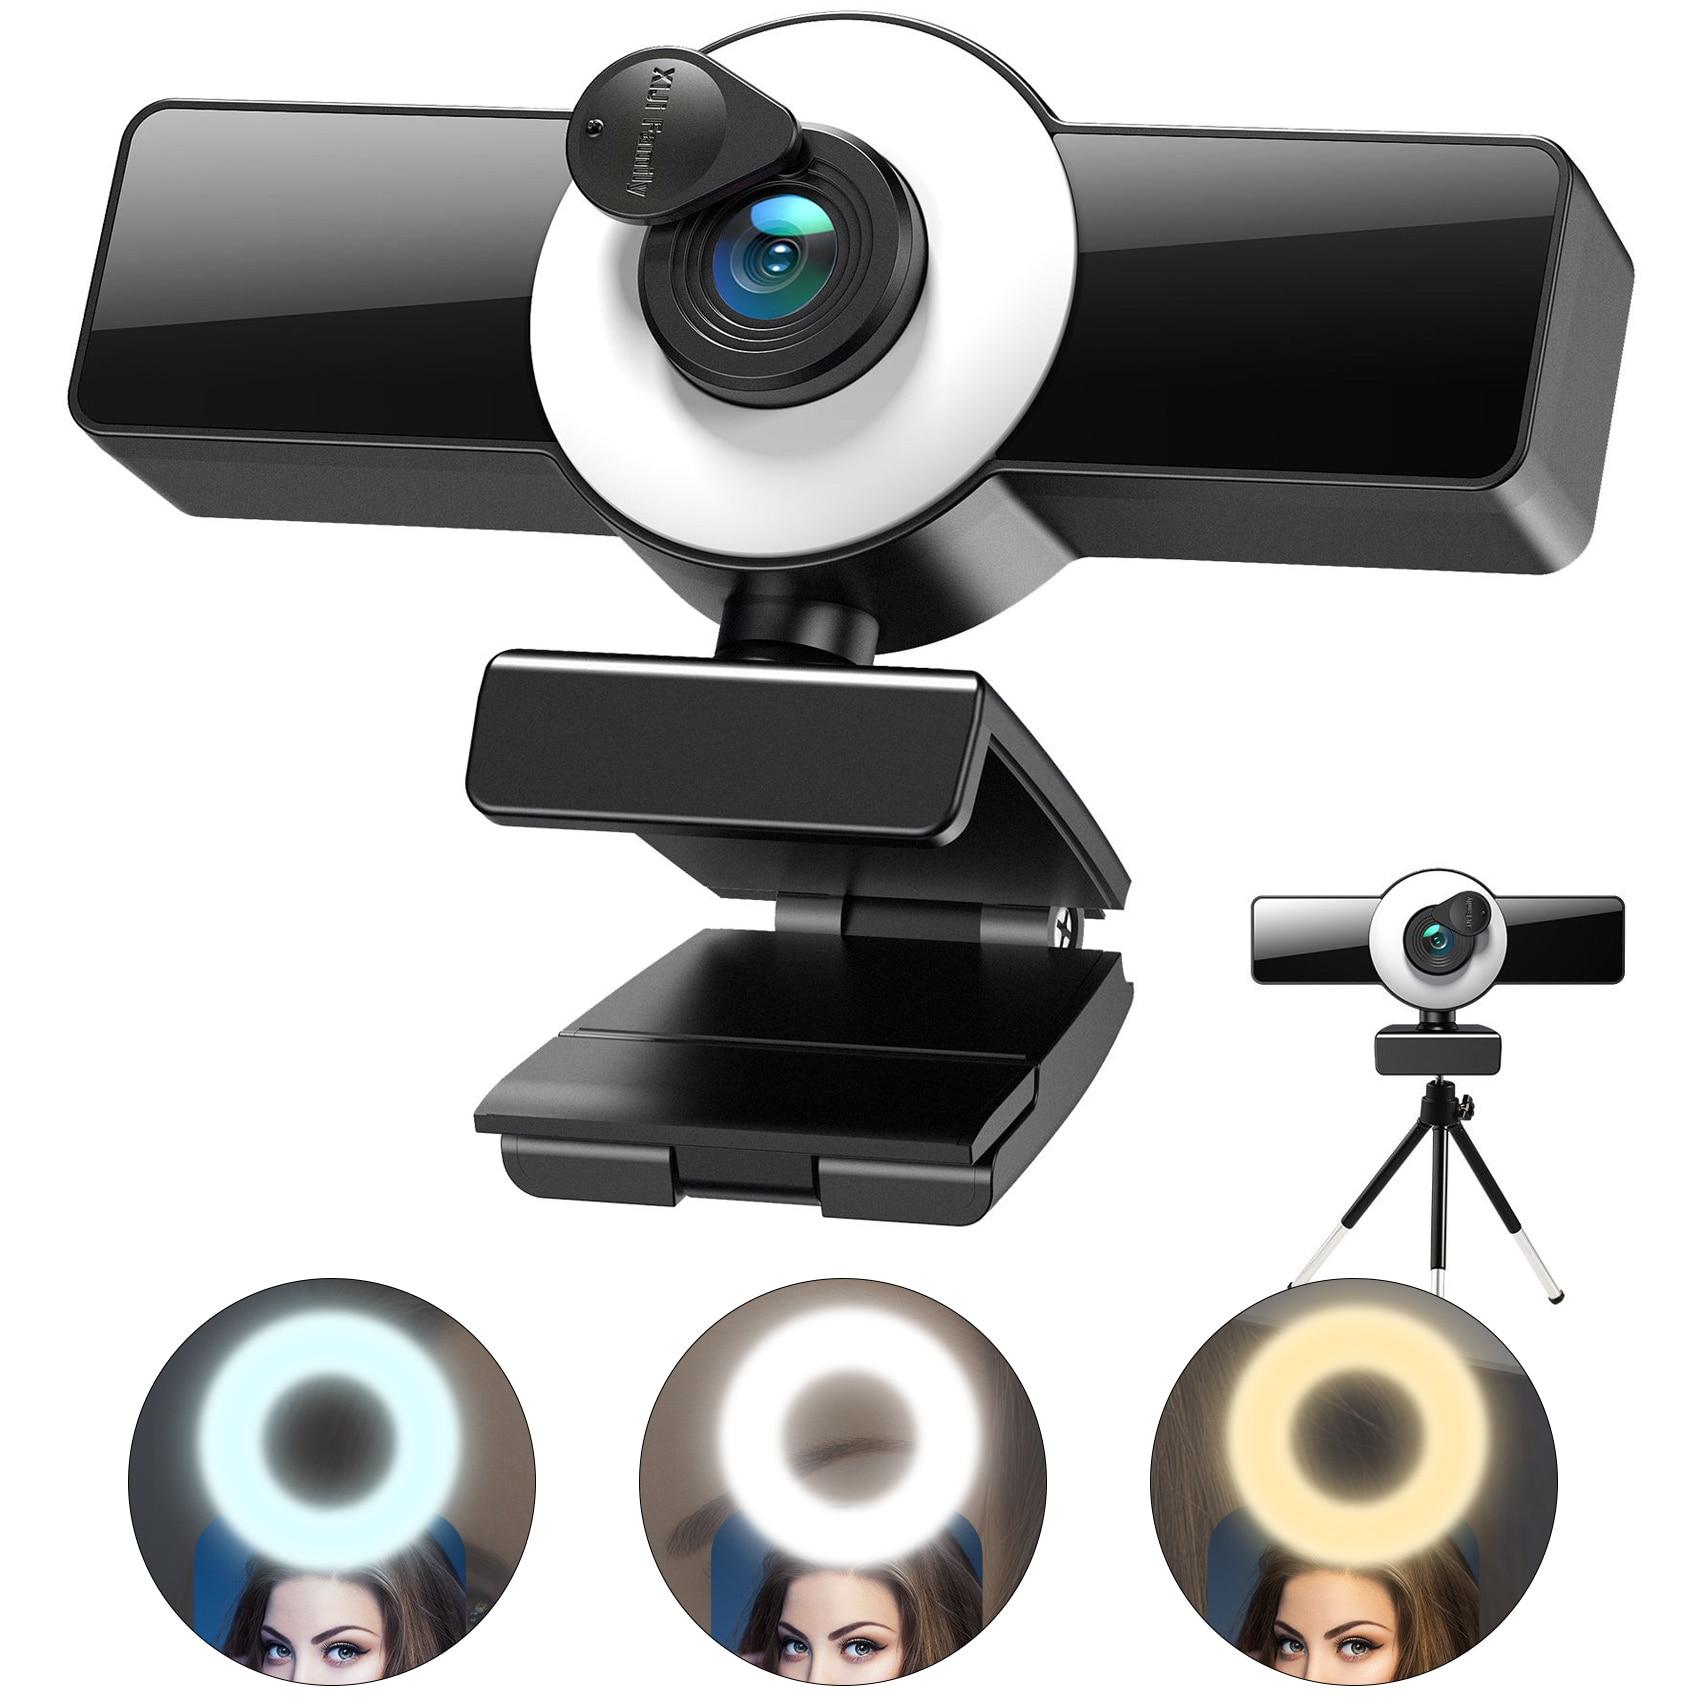 4K камера 2K Full HD веб-Камера для компьютера, ноутбука, USB веб-камера С микрофоном Autofocu веб-Камера для Youtube Live Broadcast